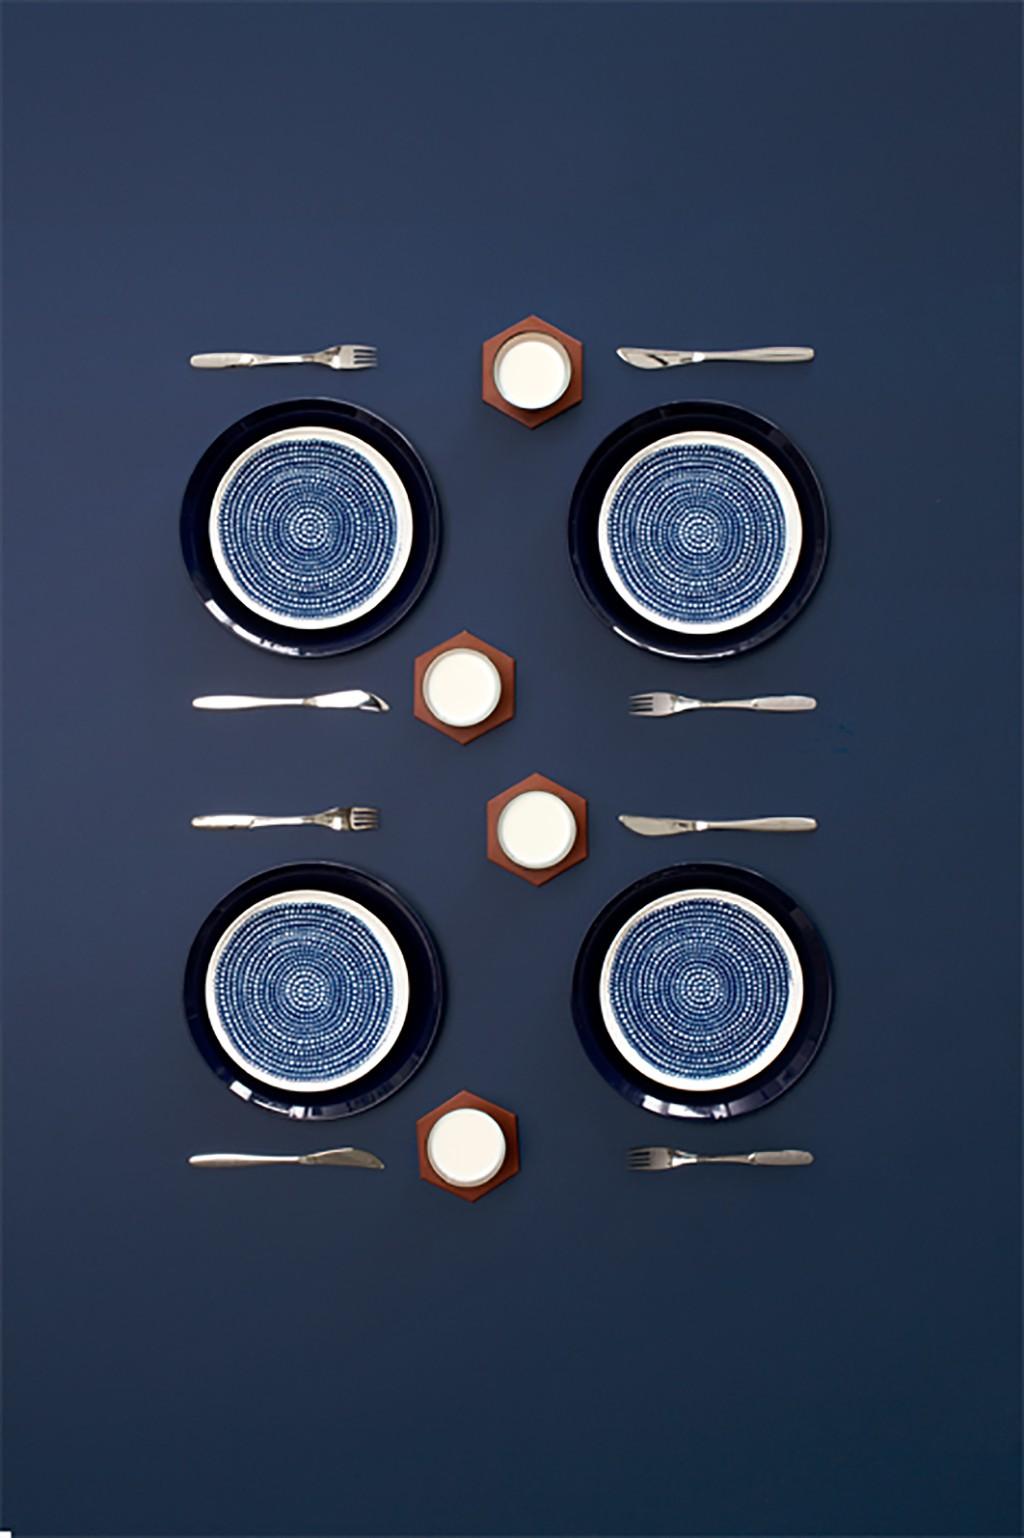 Table settings for Deko-magazine by Susanna Vento